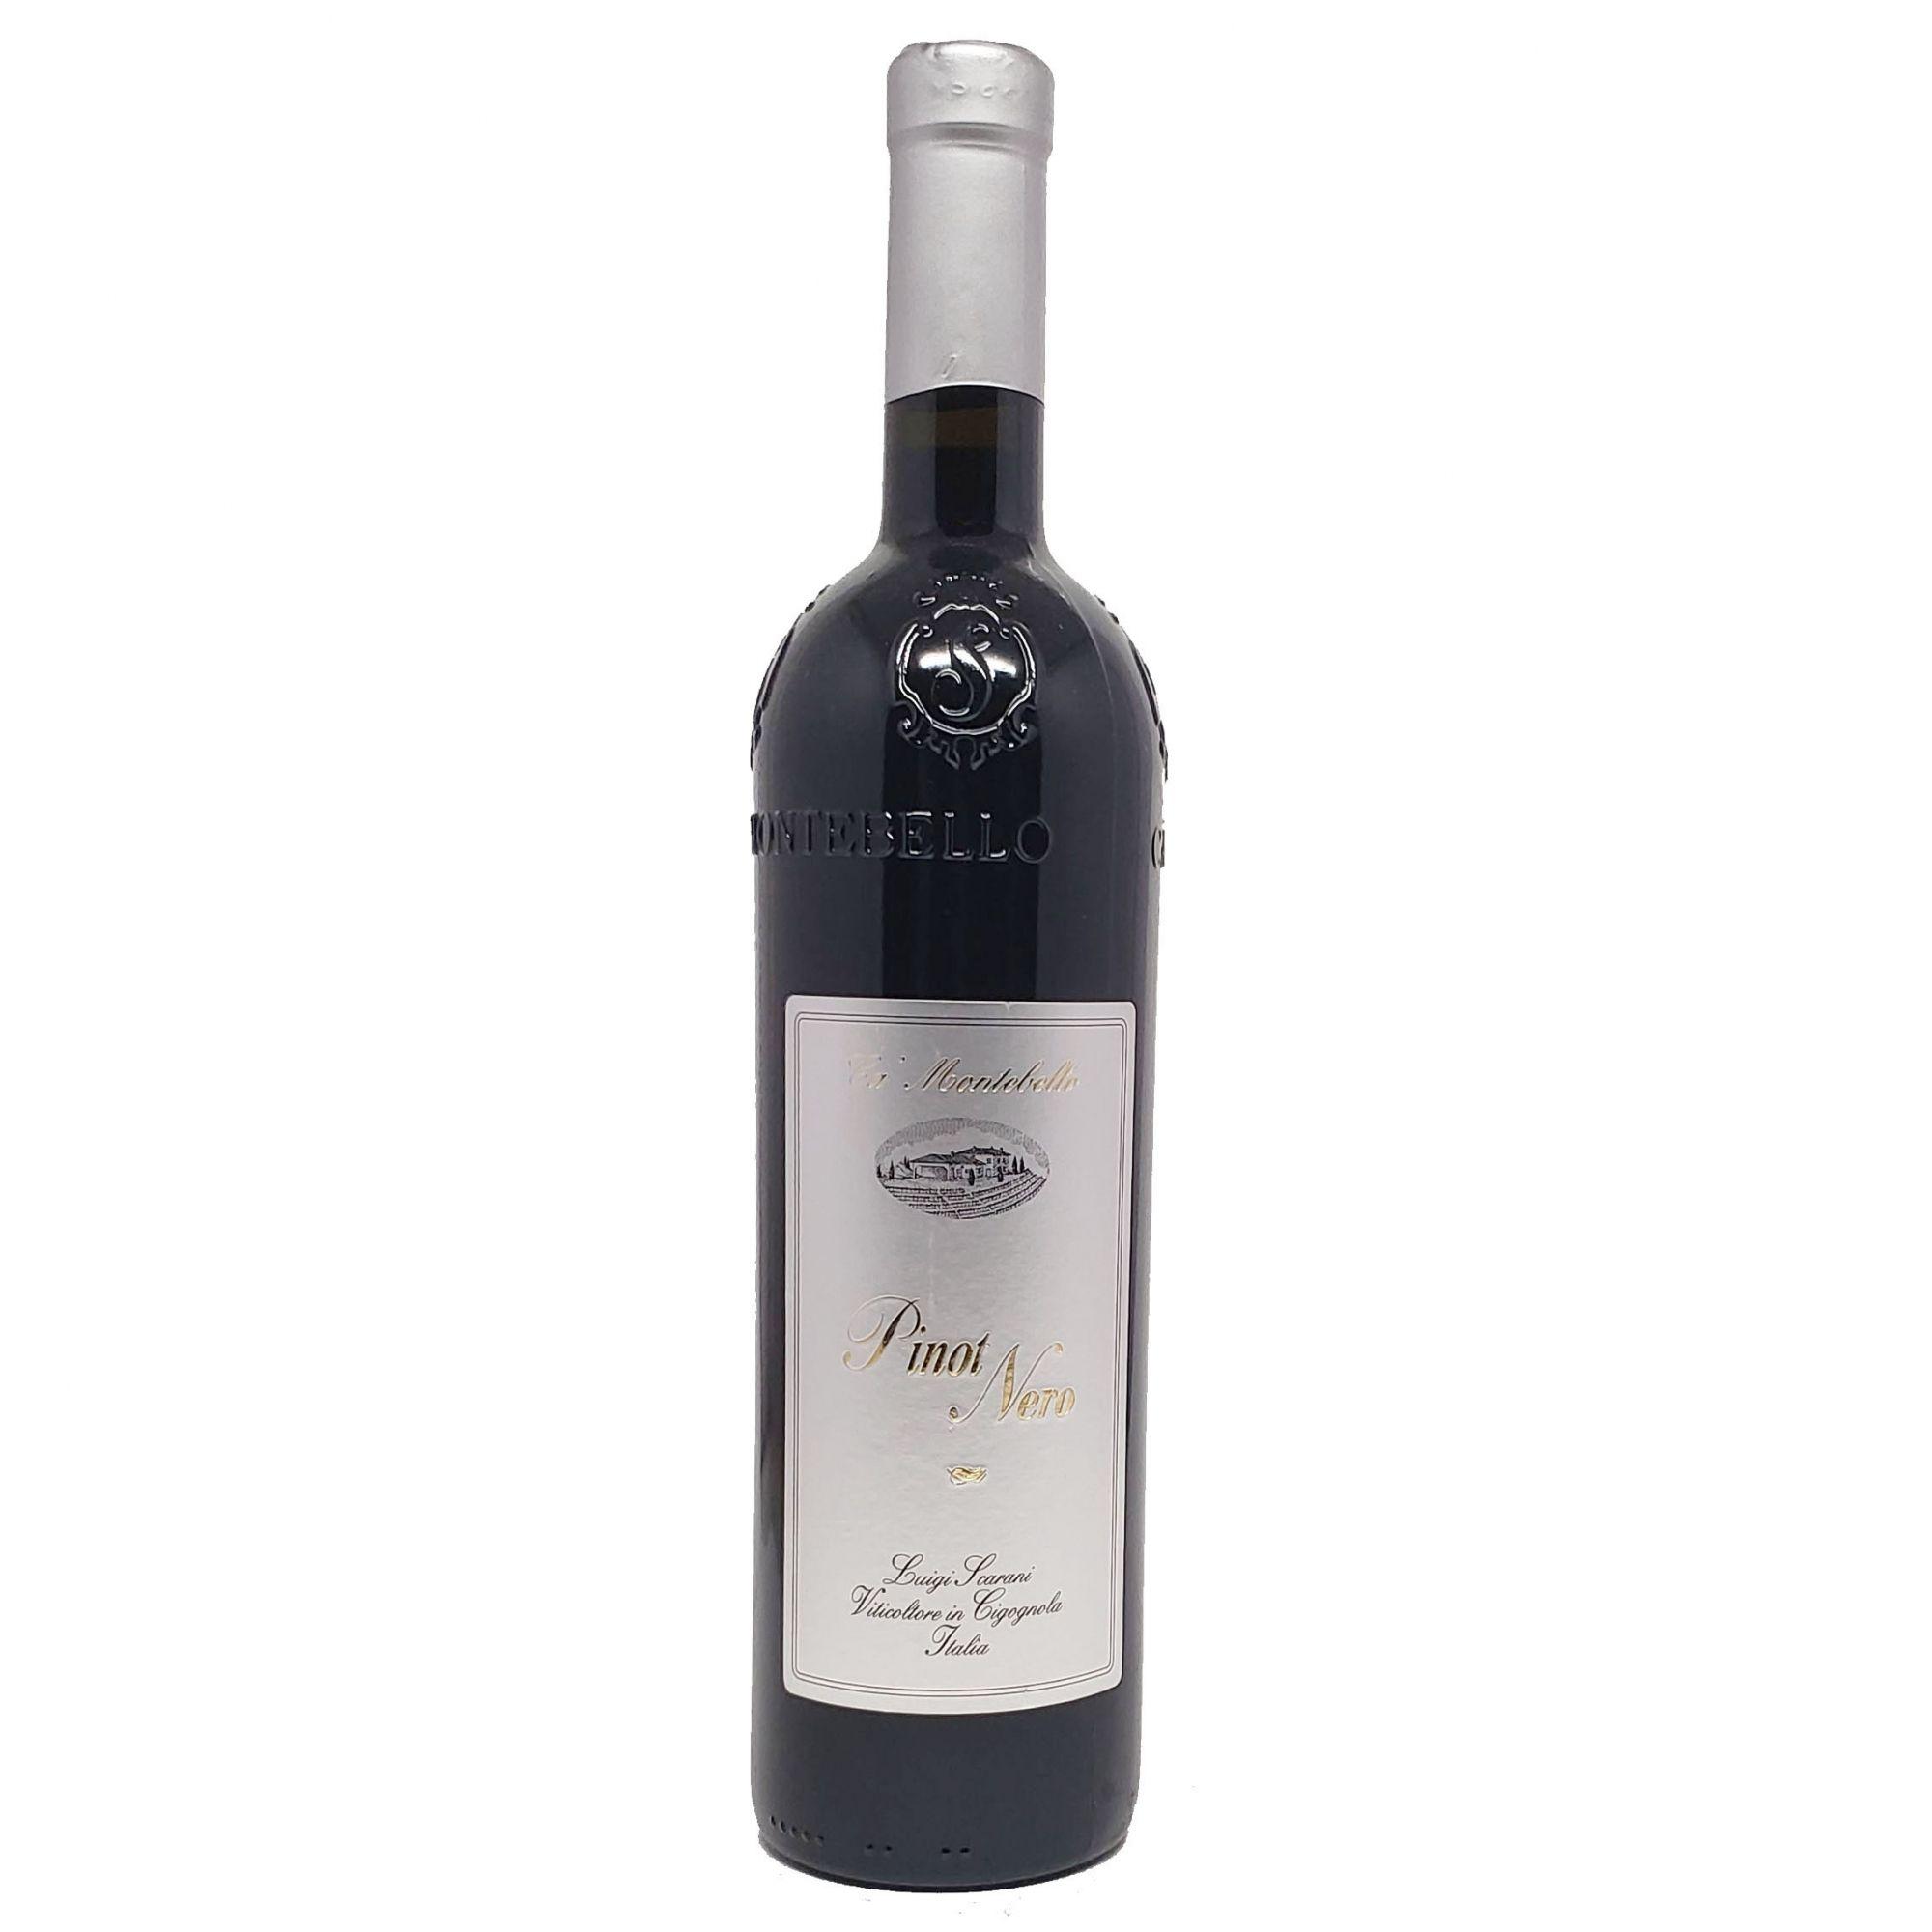 Vinho Tinto Pinot Nero Provincia Di Pavia - 750ml -